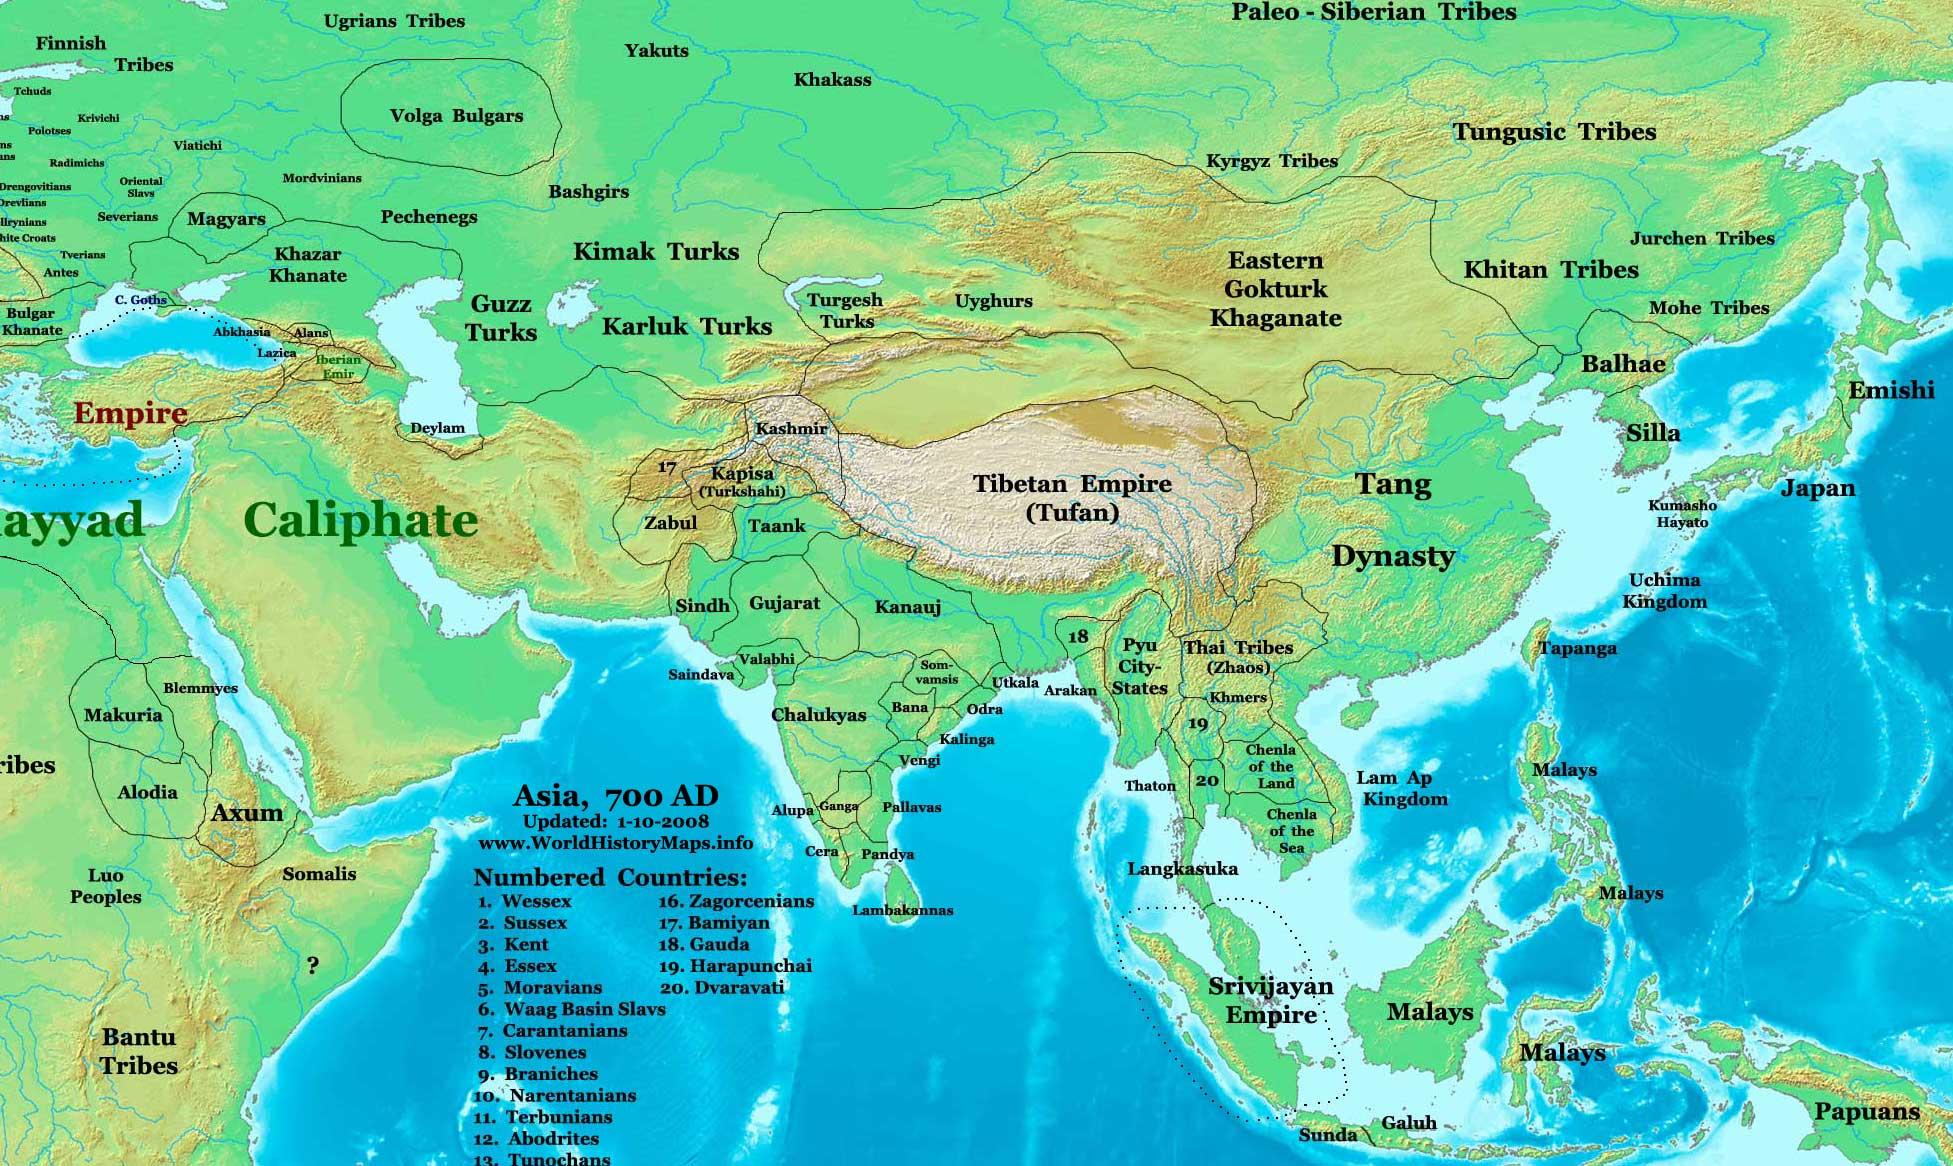 https://i0.wp.com/upload.wikimedia.org/wikipedia/commons/9/9c/Asia_700ad.jpg